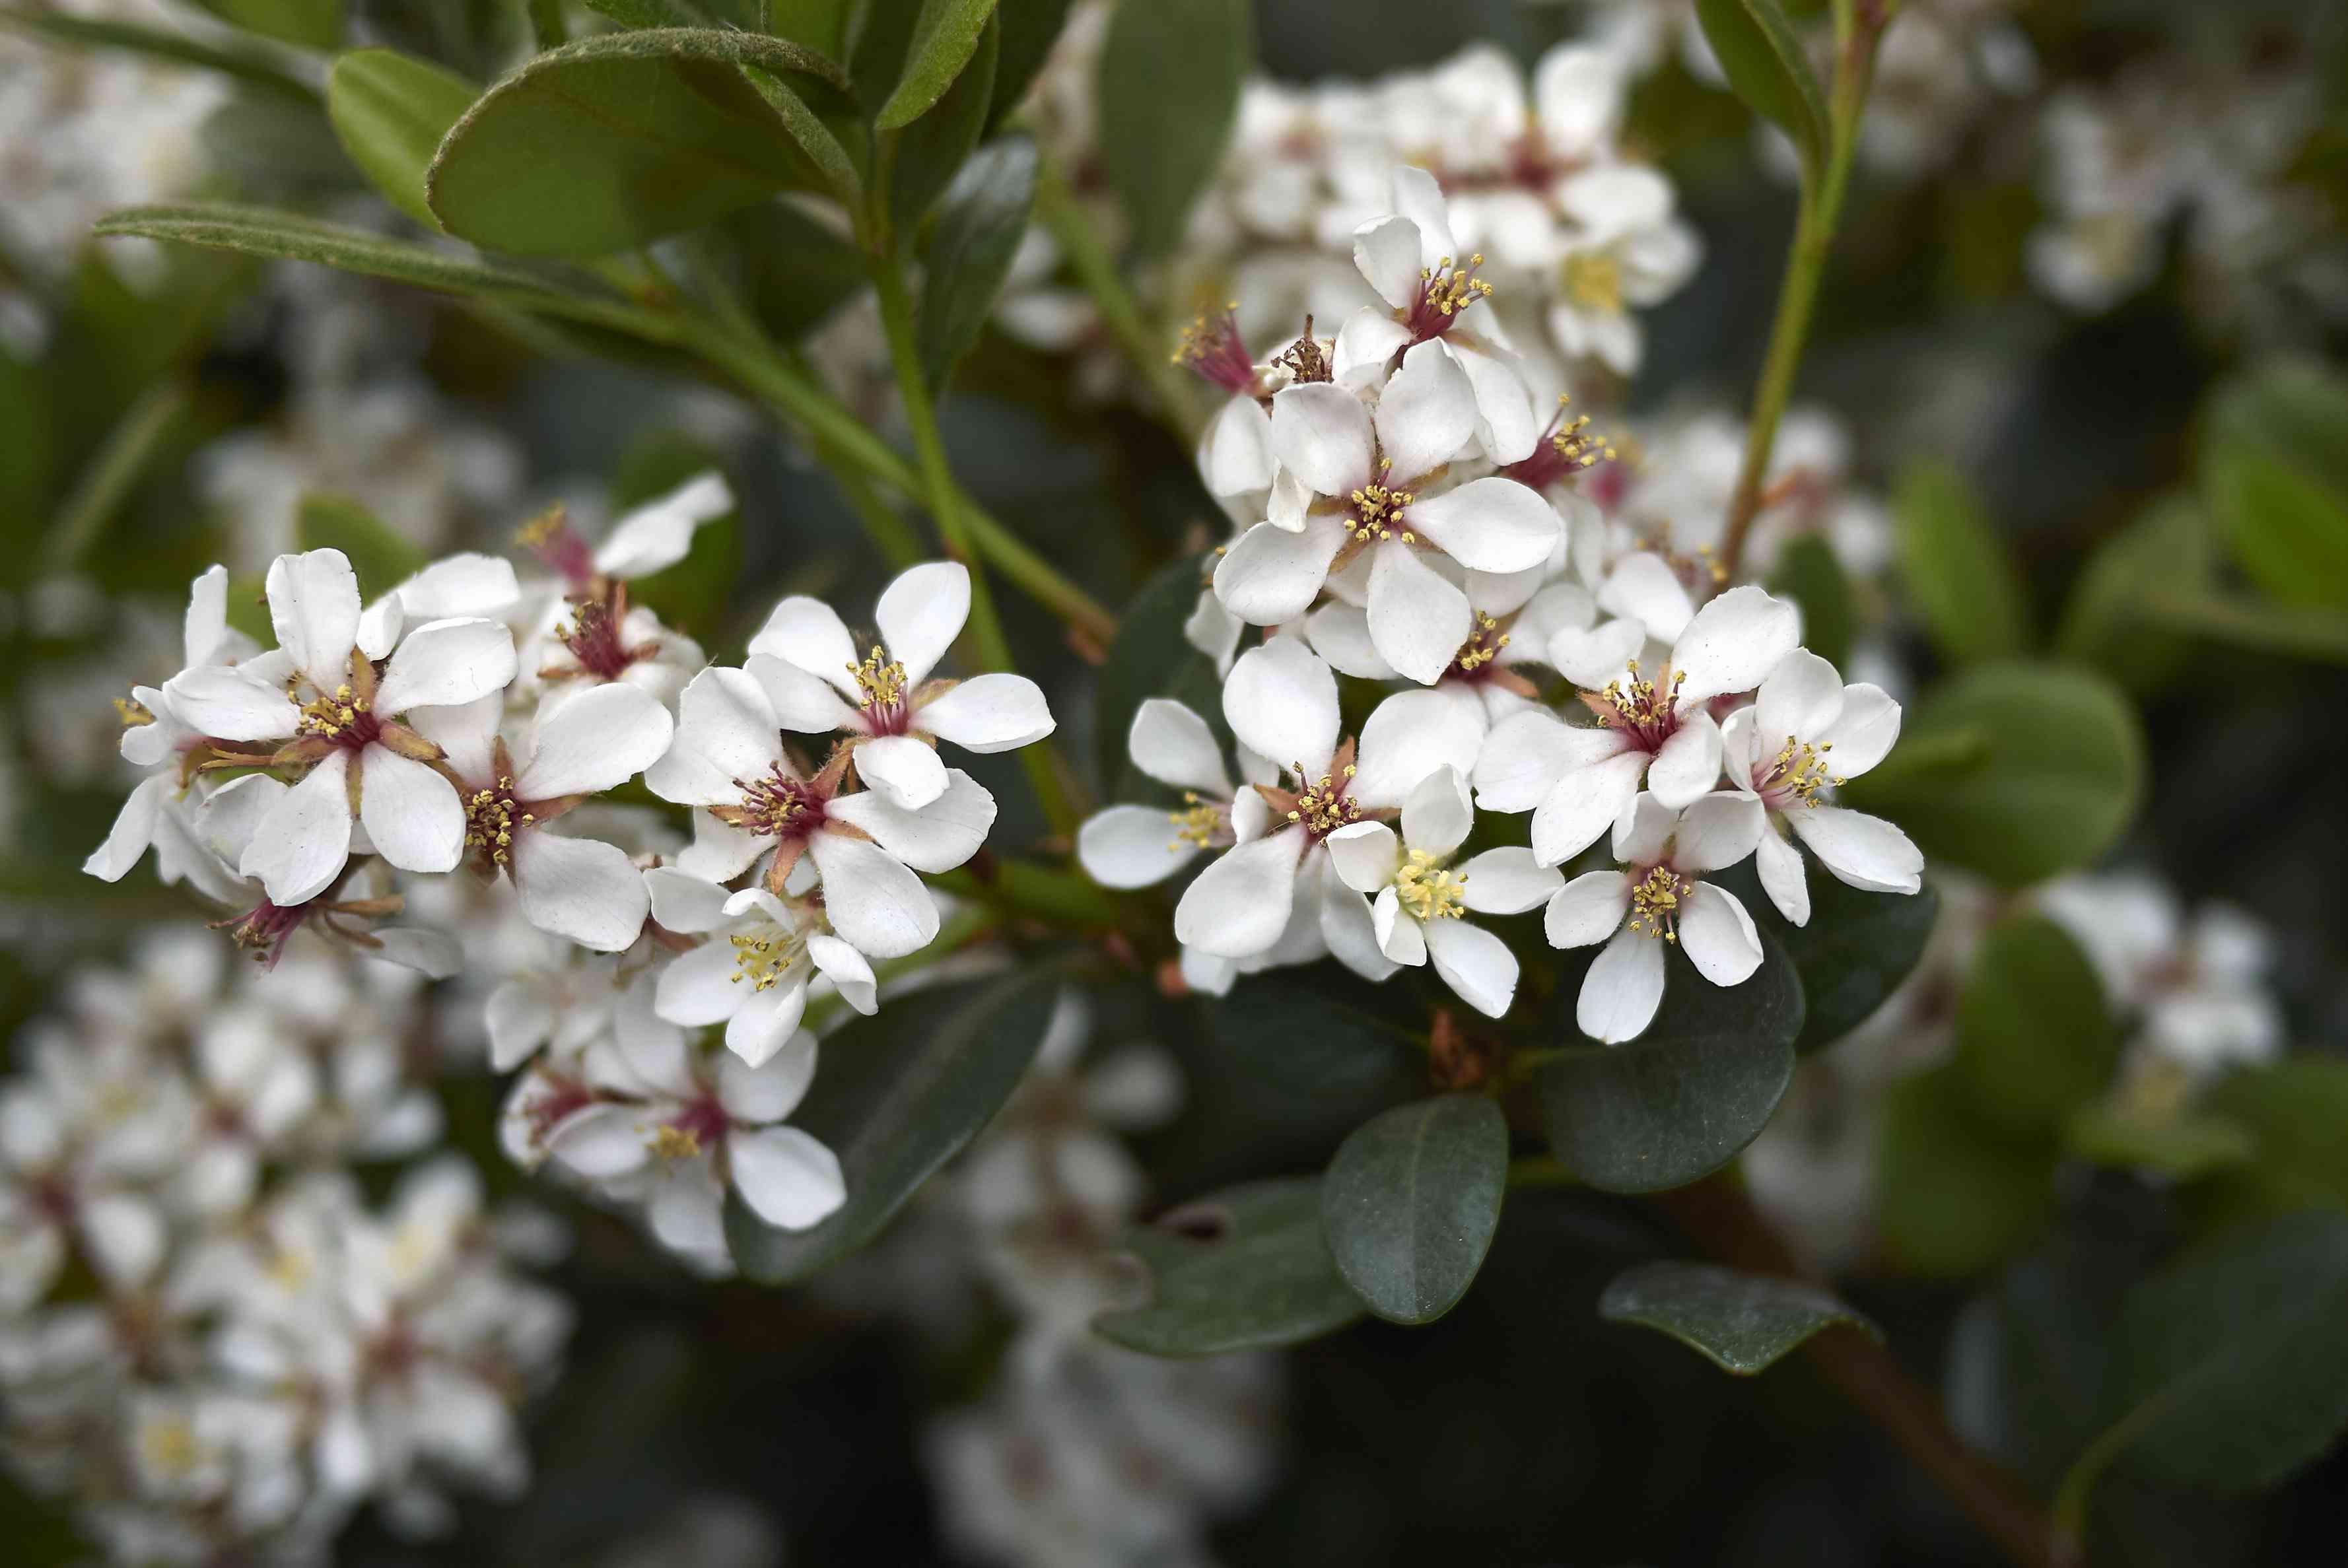 Rhaphiolepis indica 'Indica Princess' blooms